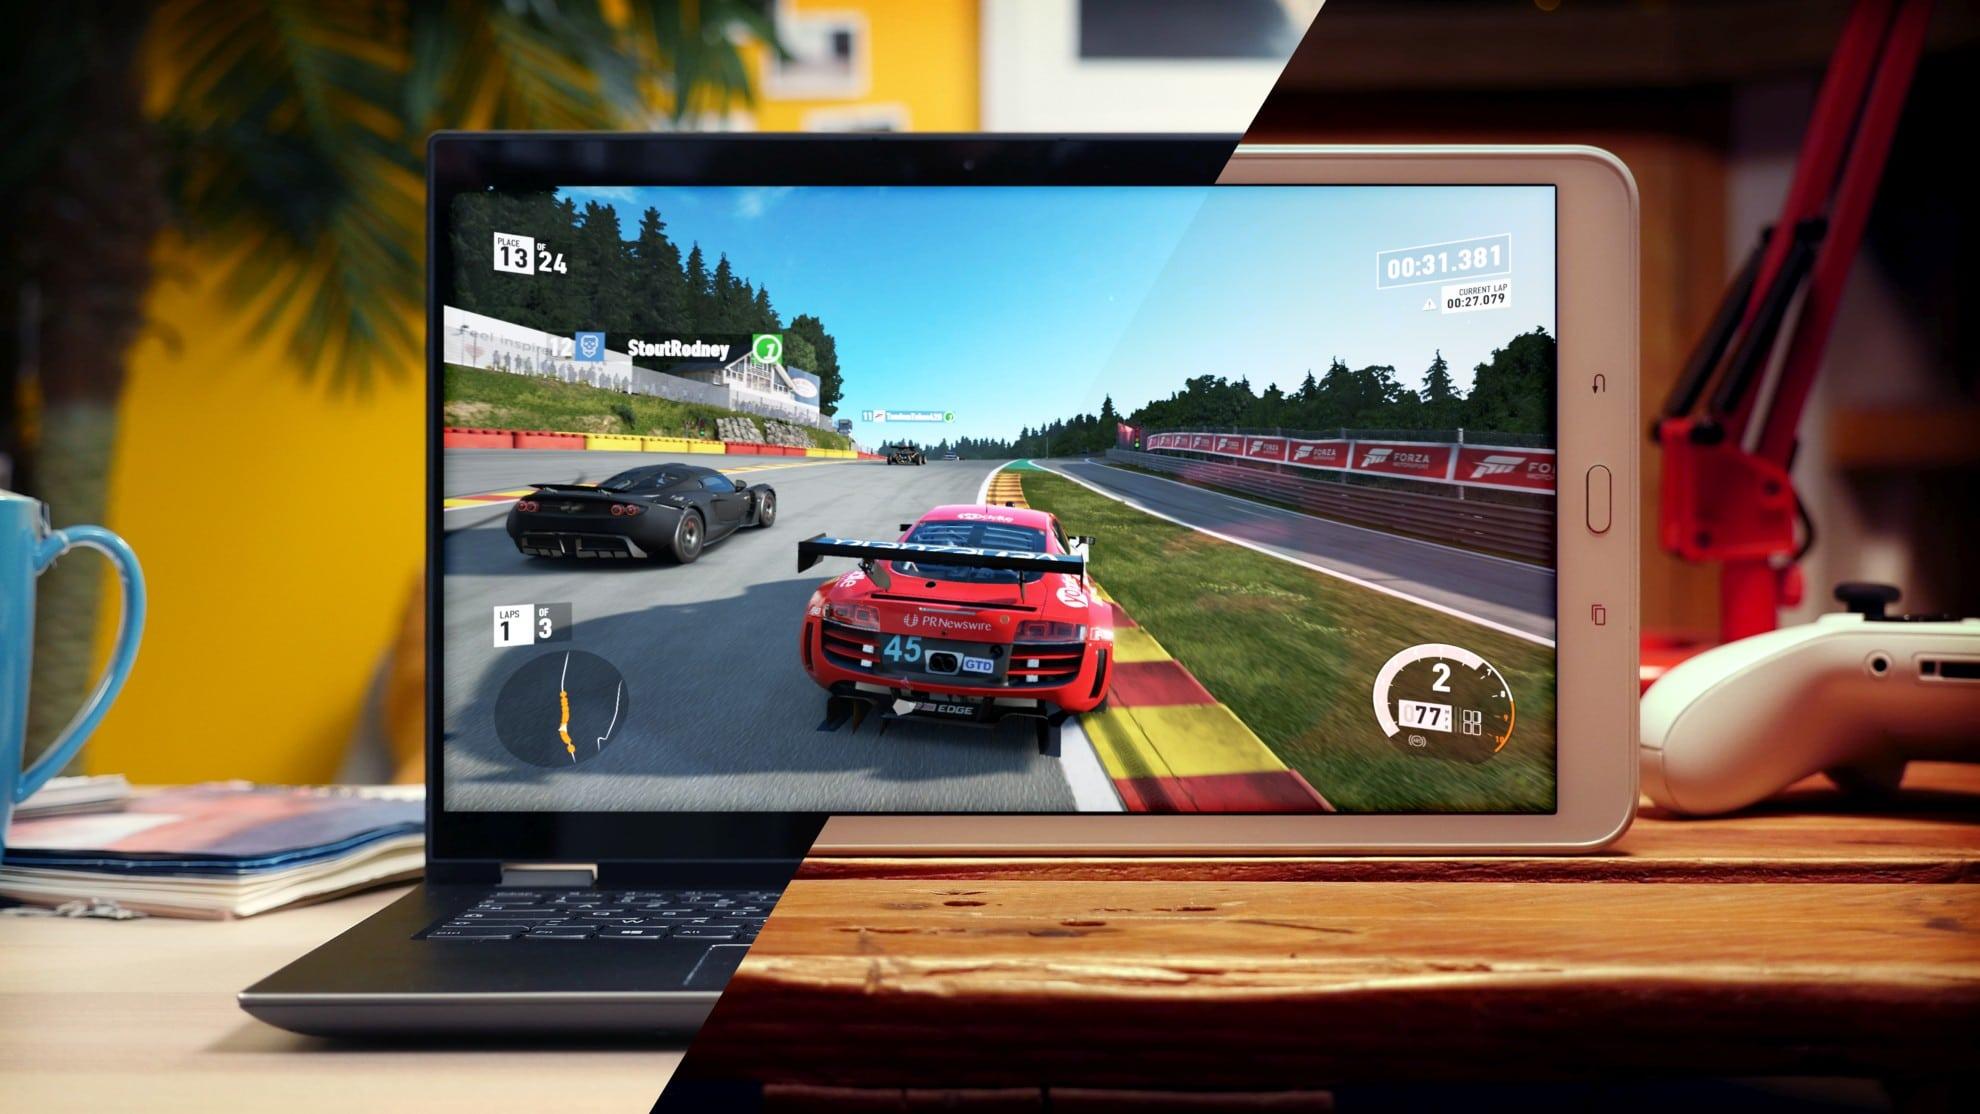 Blade Shadow: Virtueller Gaming-Rechner im Monatsabo